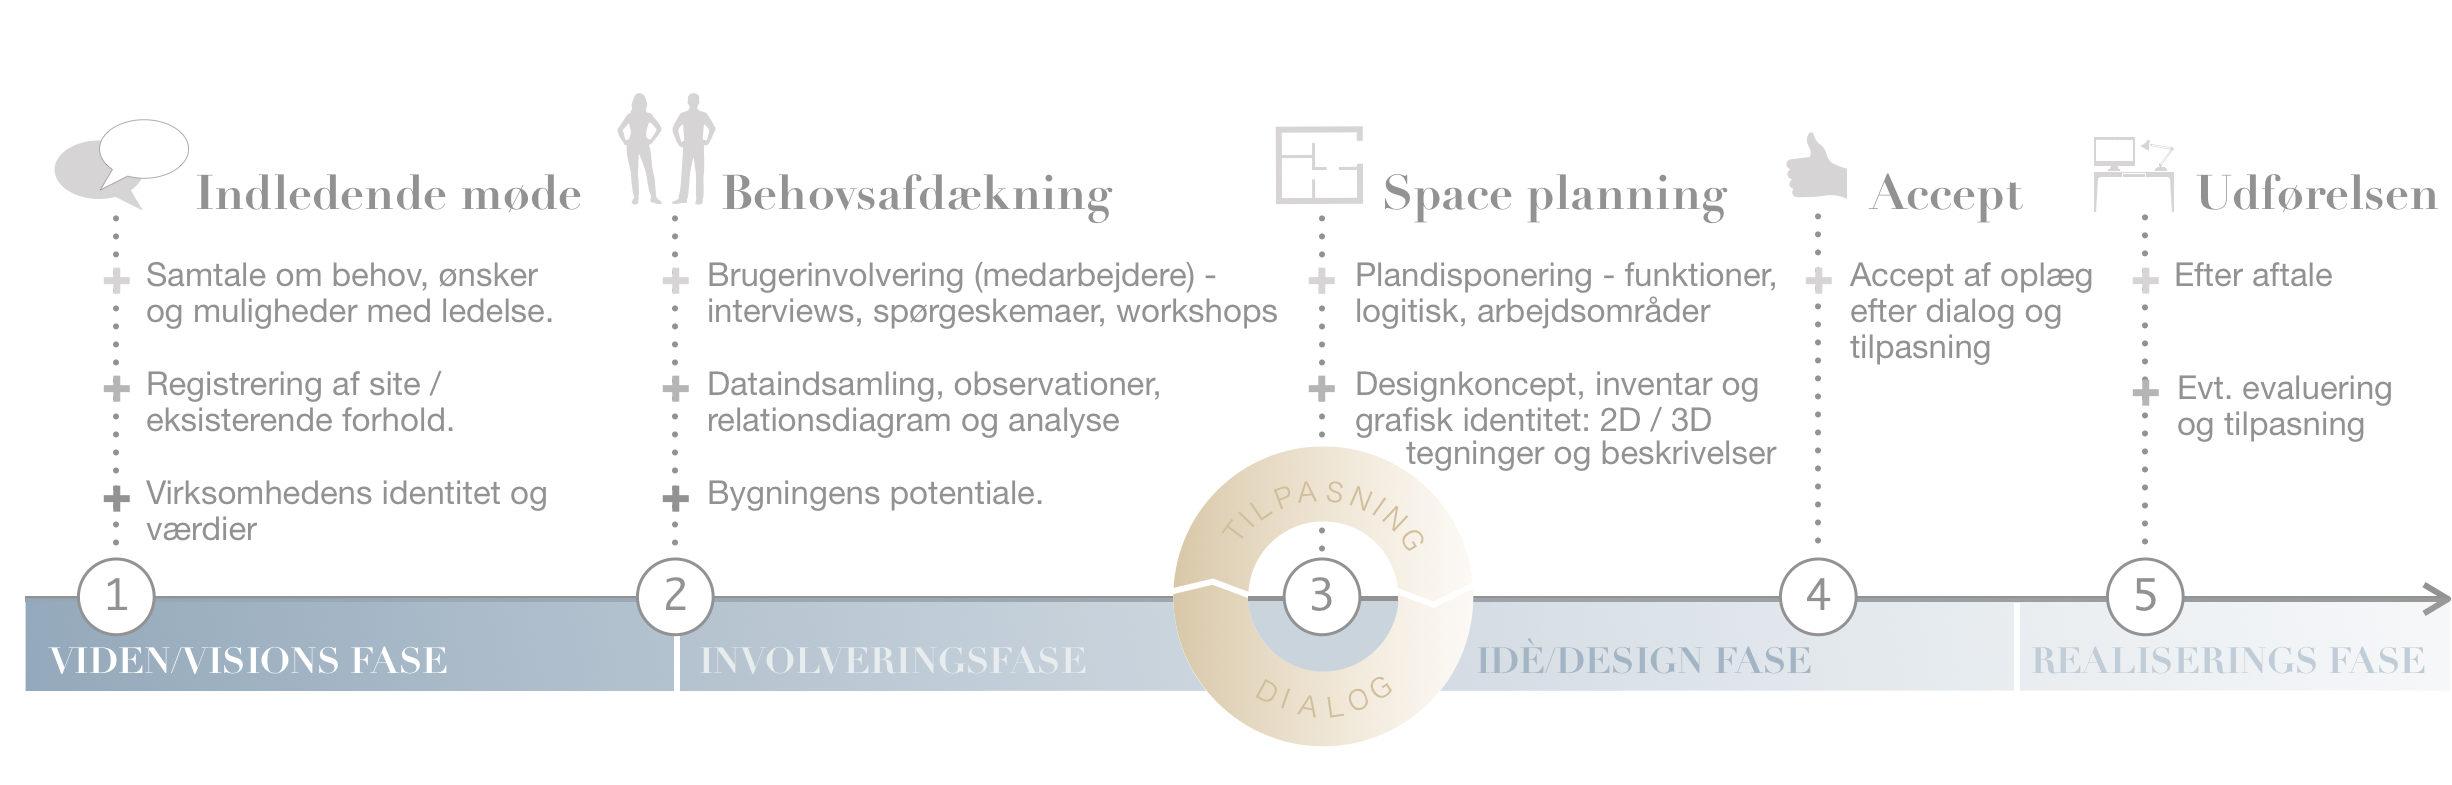 BORN Architect_Proces_Design&interiør_Space planning